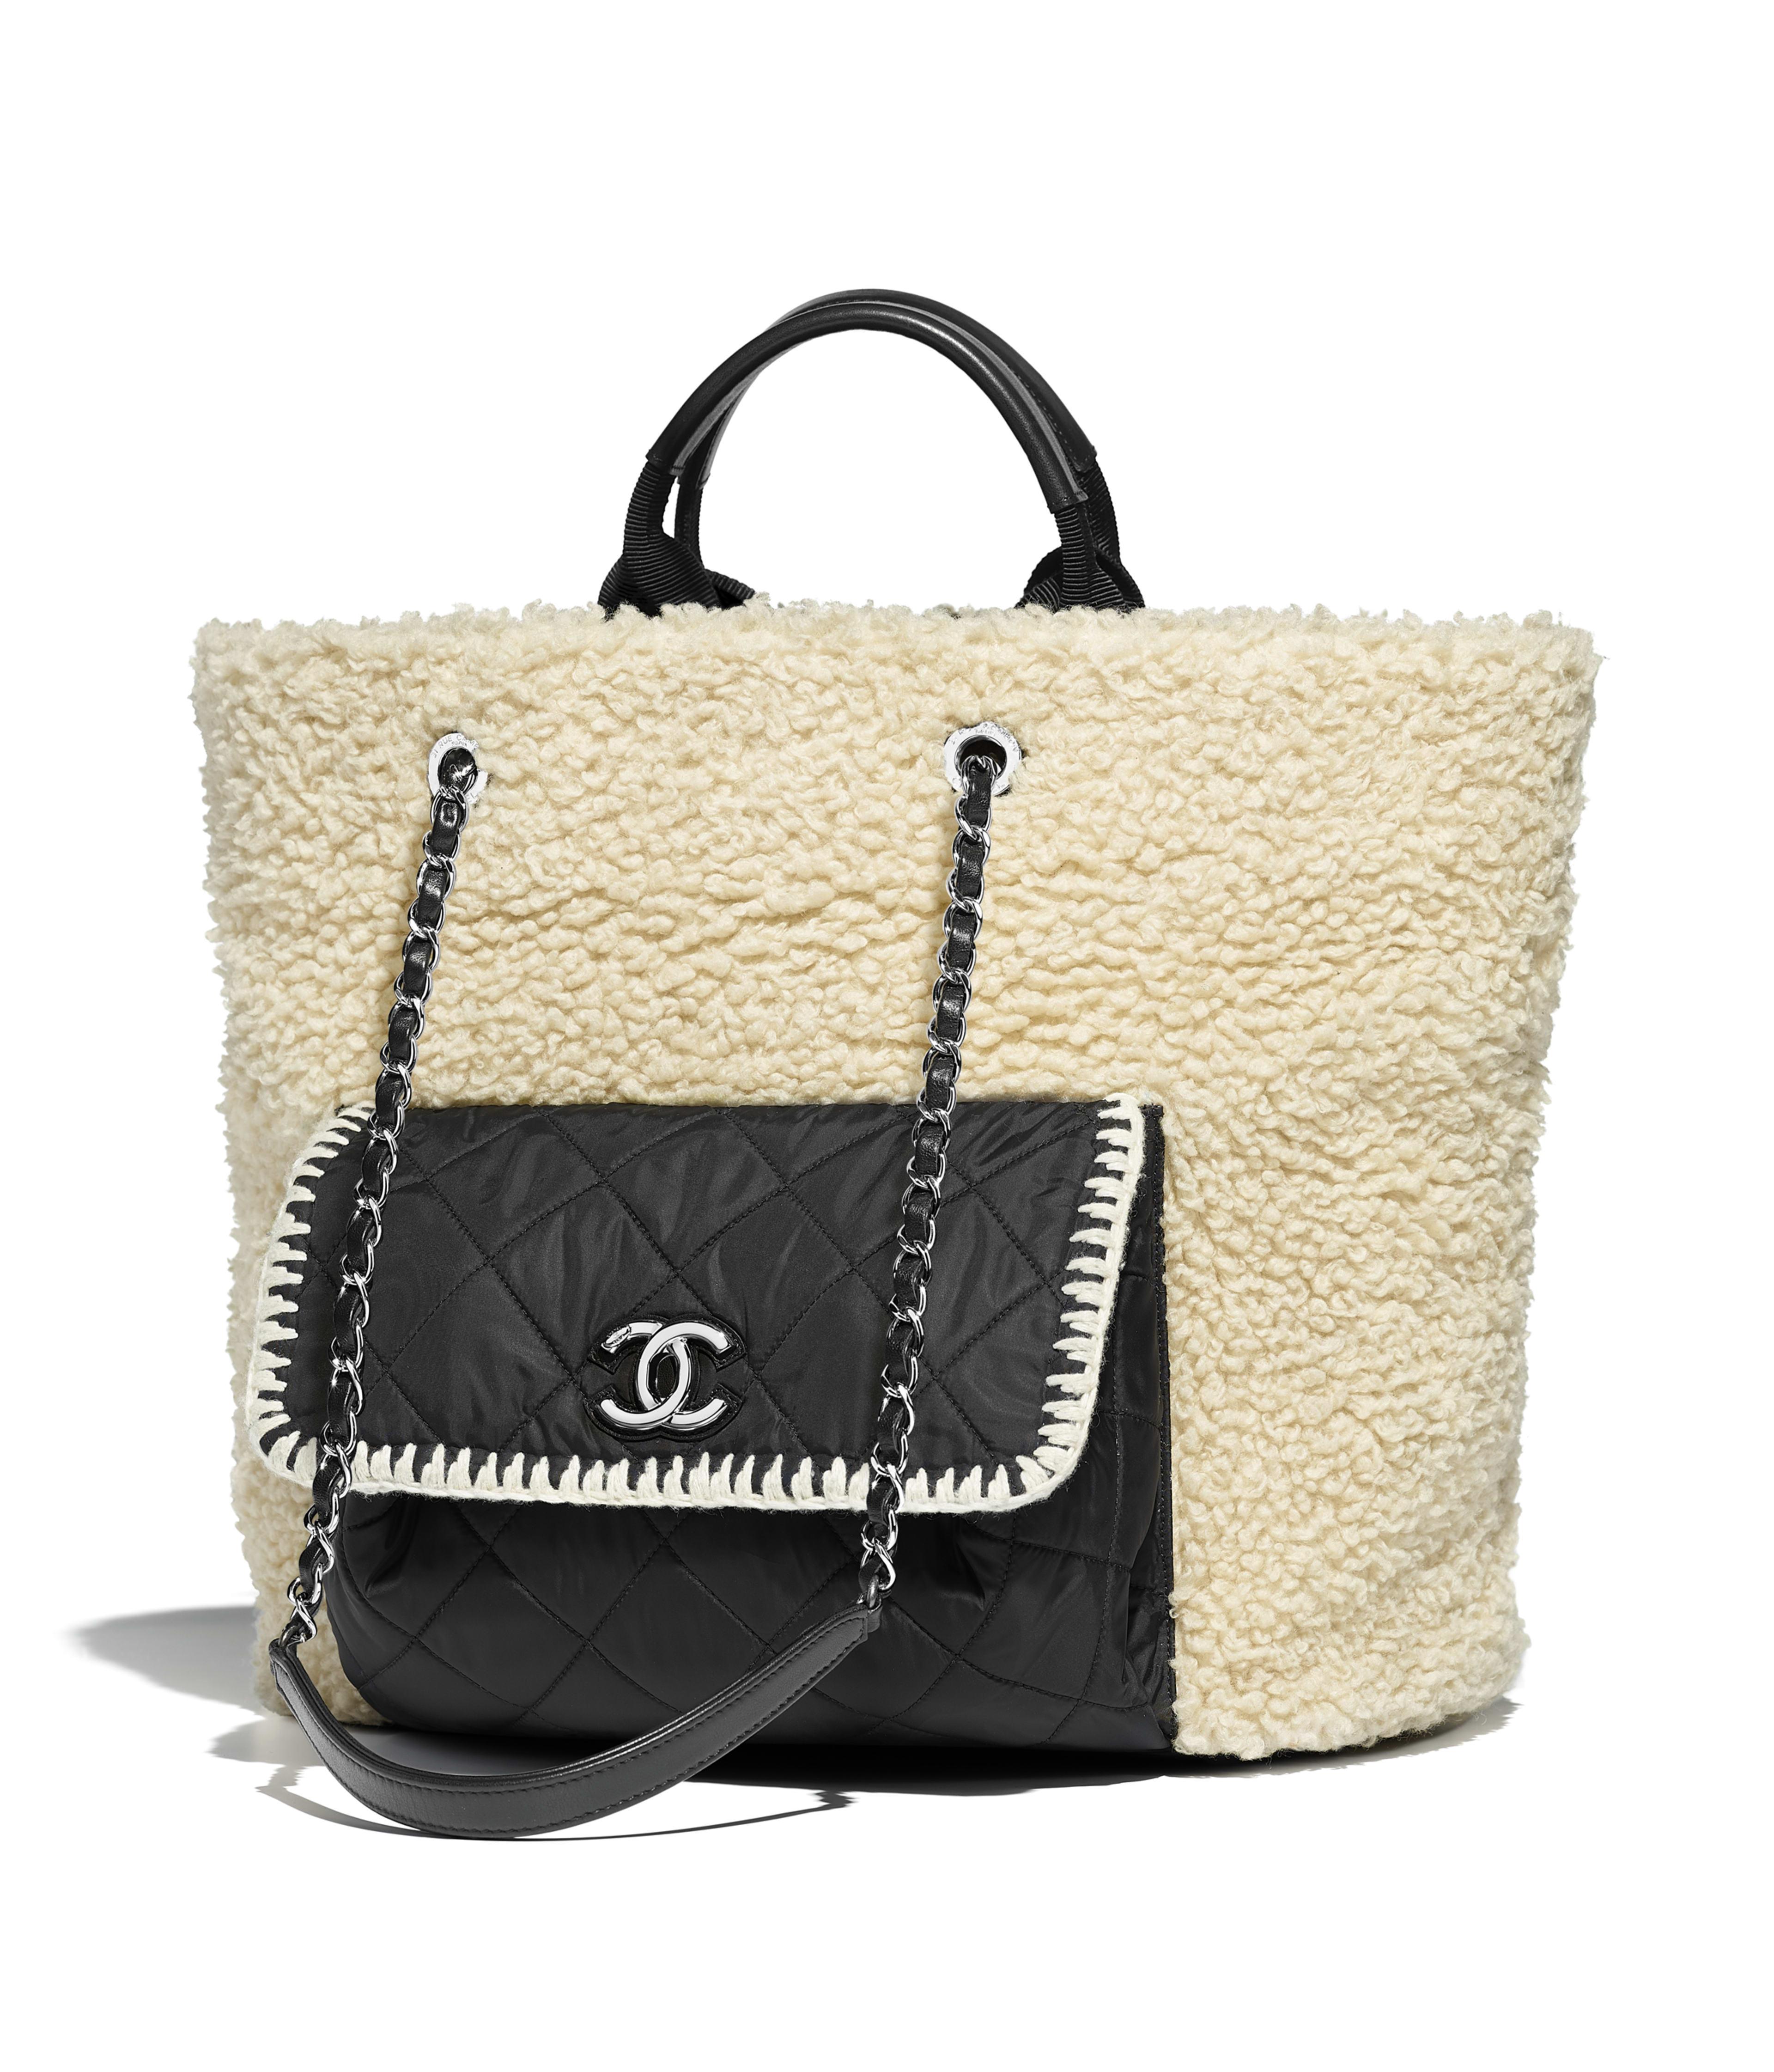 Large Ping Bag Wool Nylon Calfskin Silver Tone Metal Black Ecru Ref A57582y83829c2117